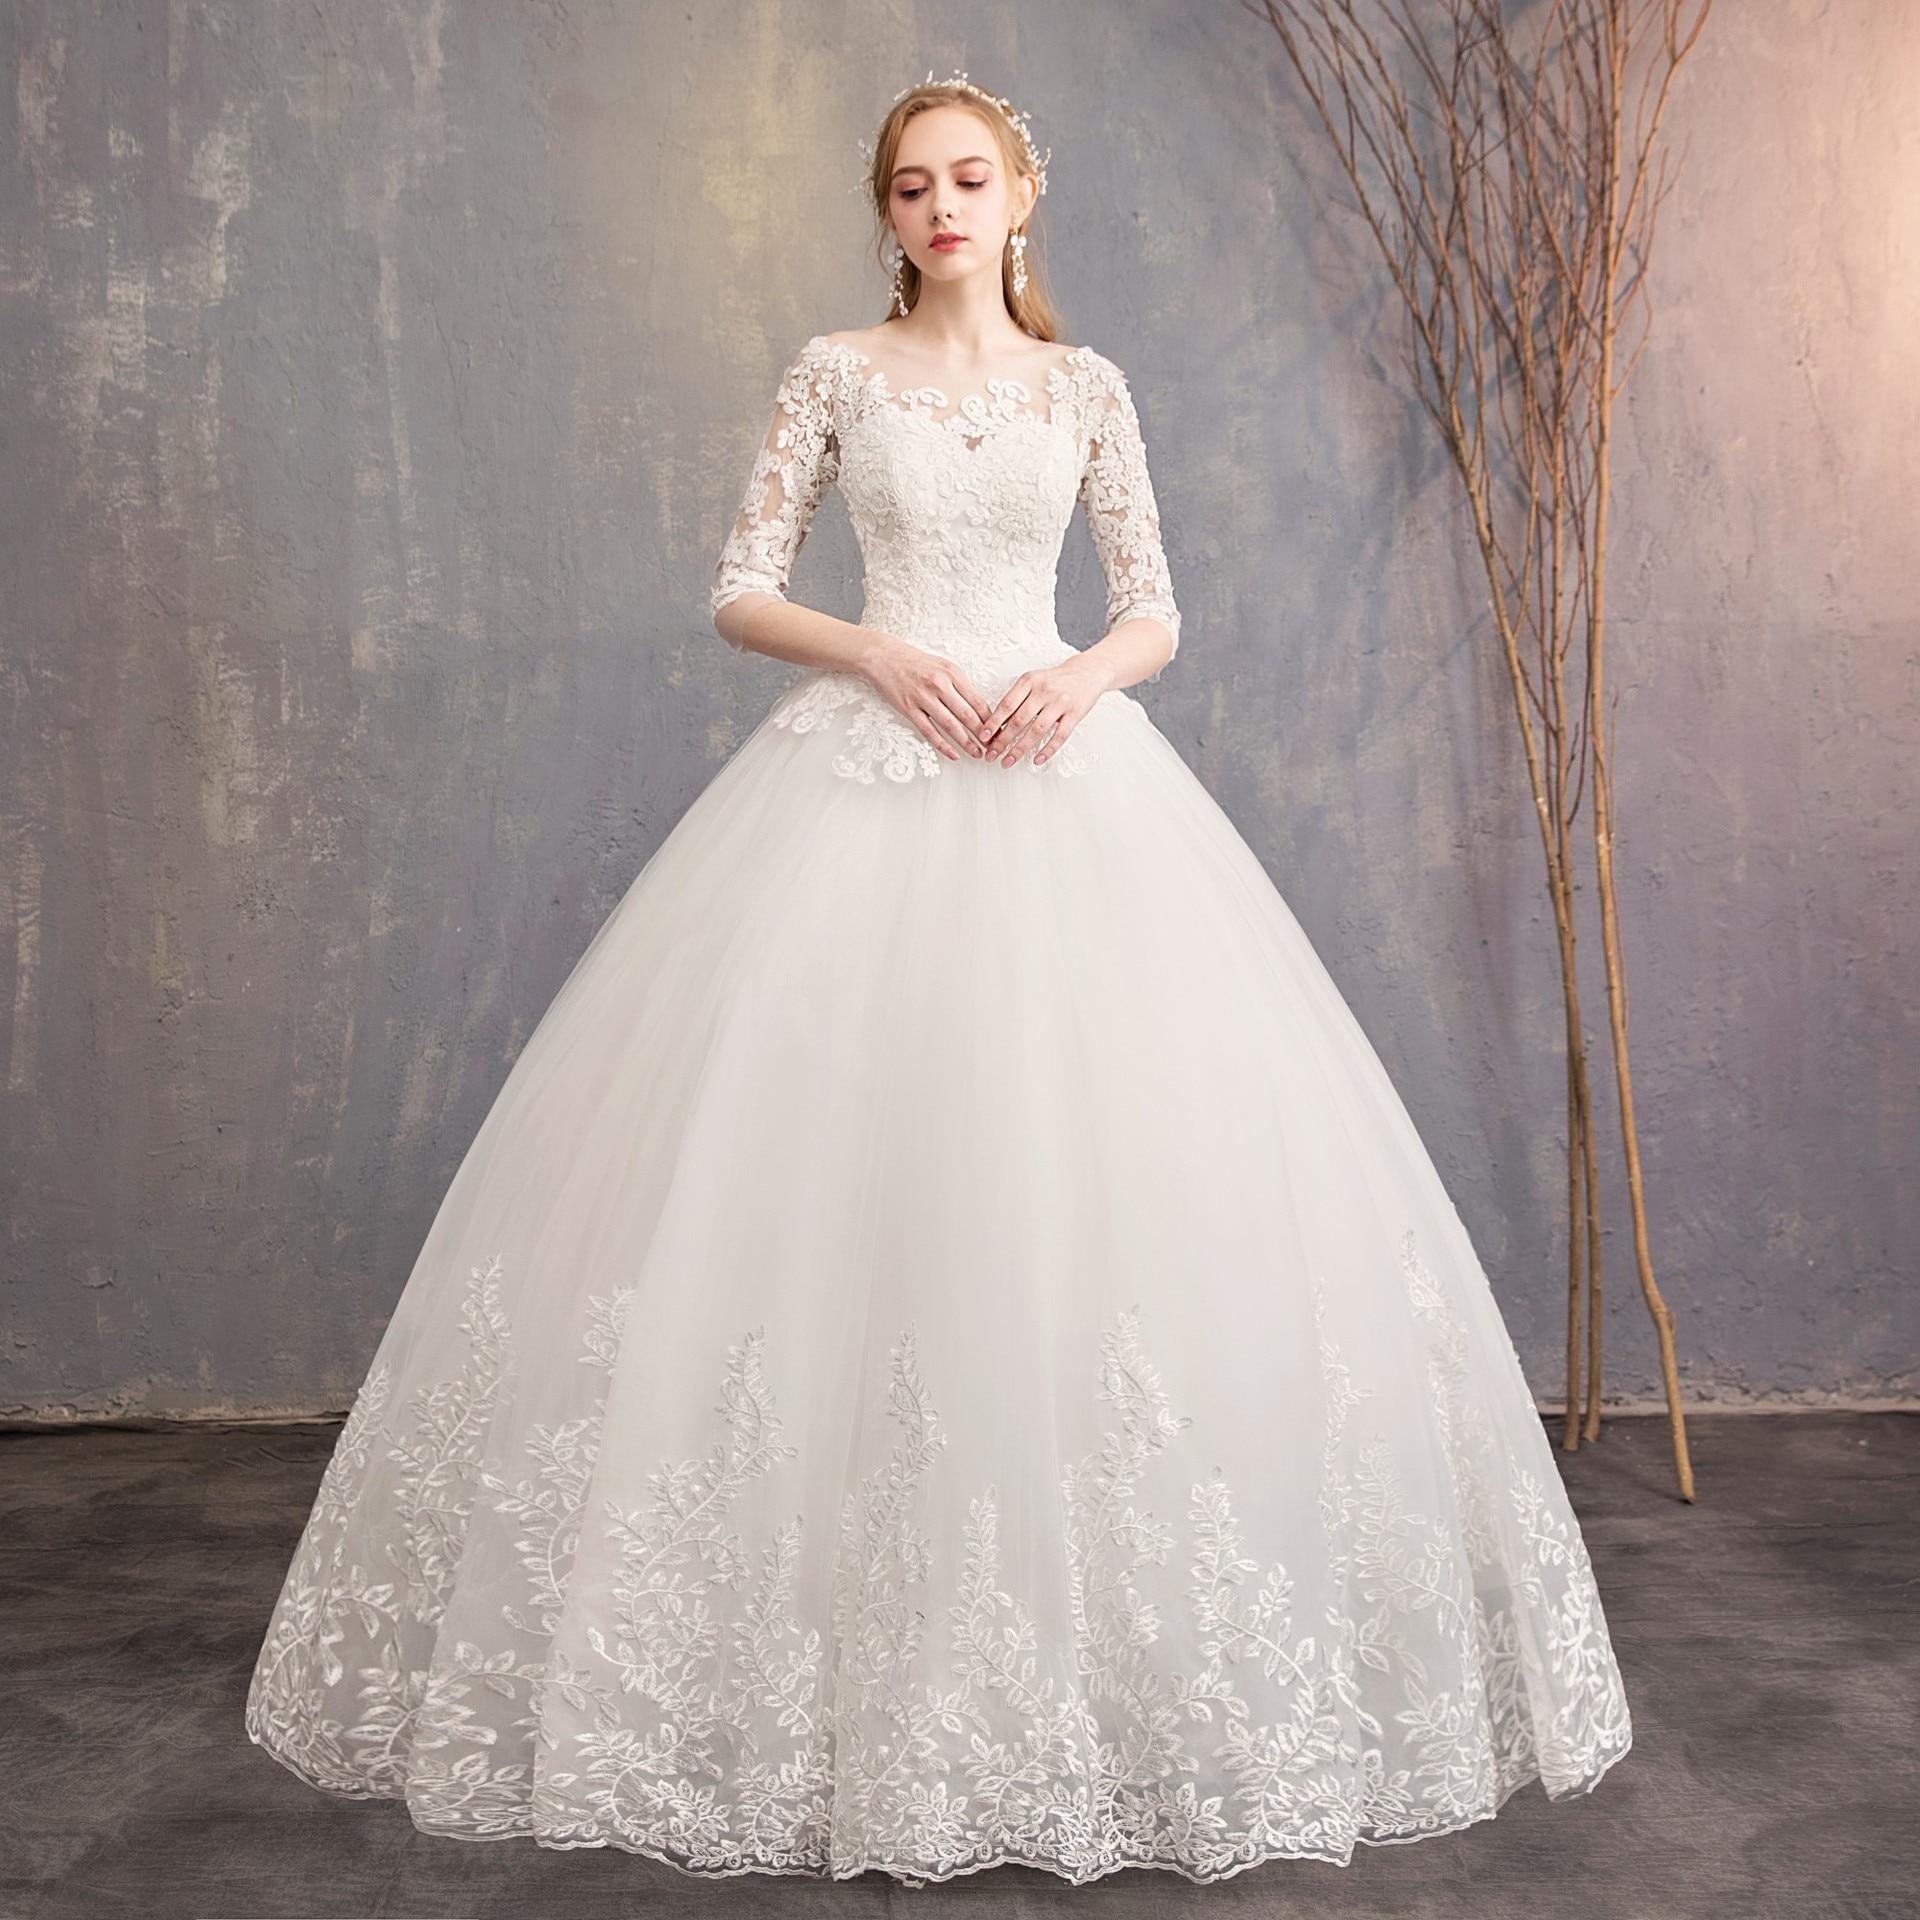 2019 New Arrival EZKUNTZA Half Sleeve Wedding Dress Lace Ball Gown Princess Simple Wedding Gown Bride Dress Vestido De Noiva